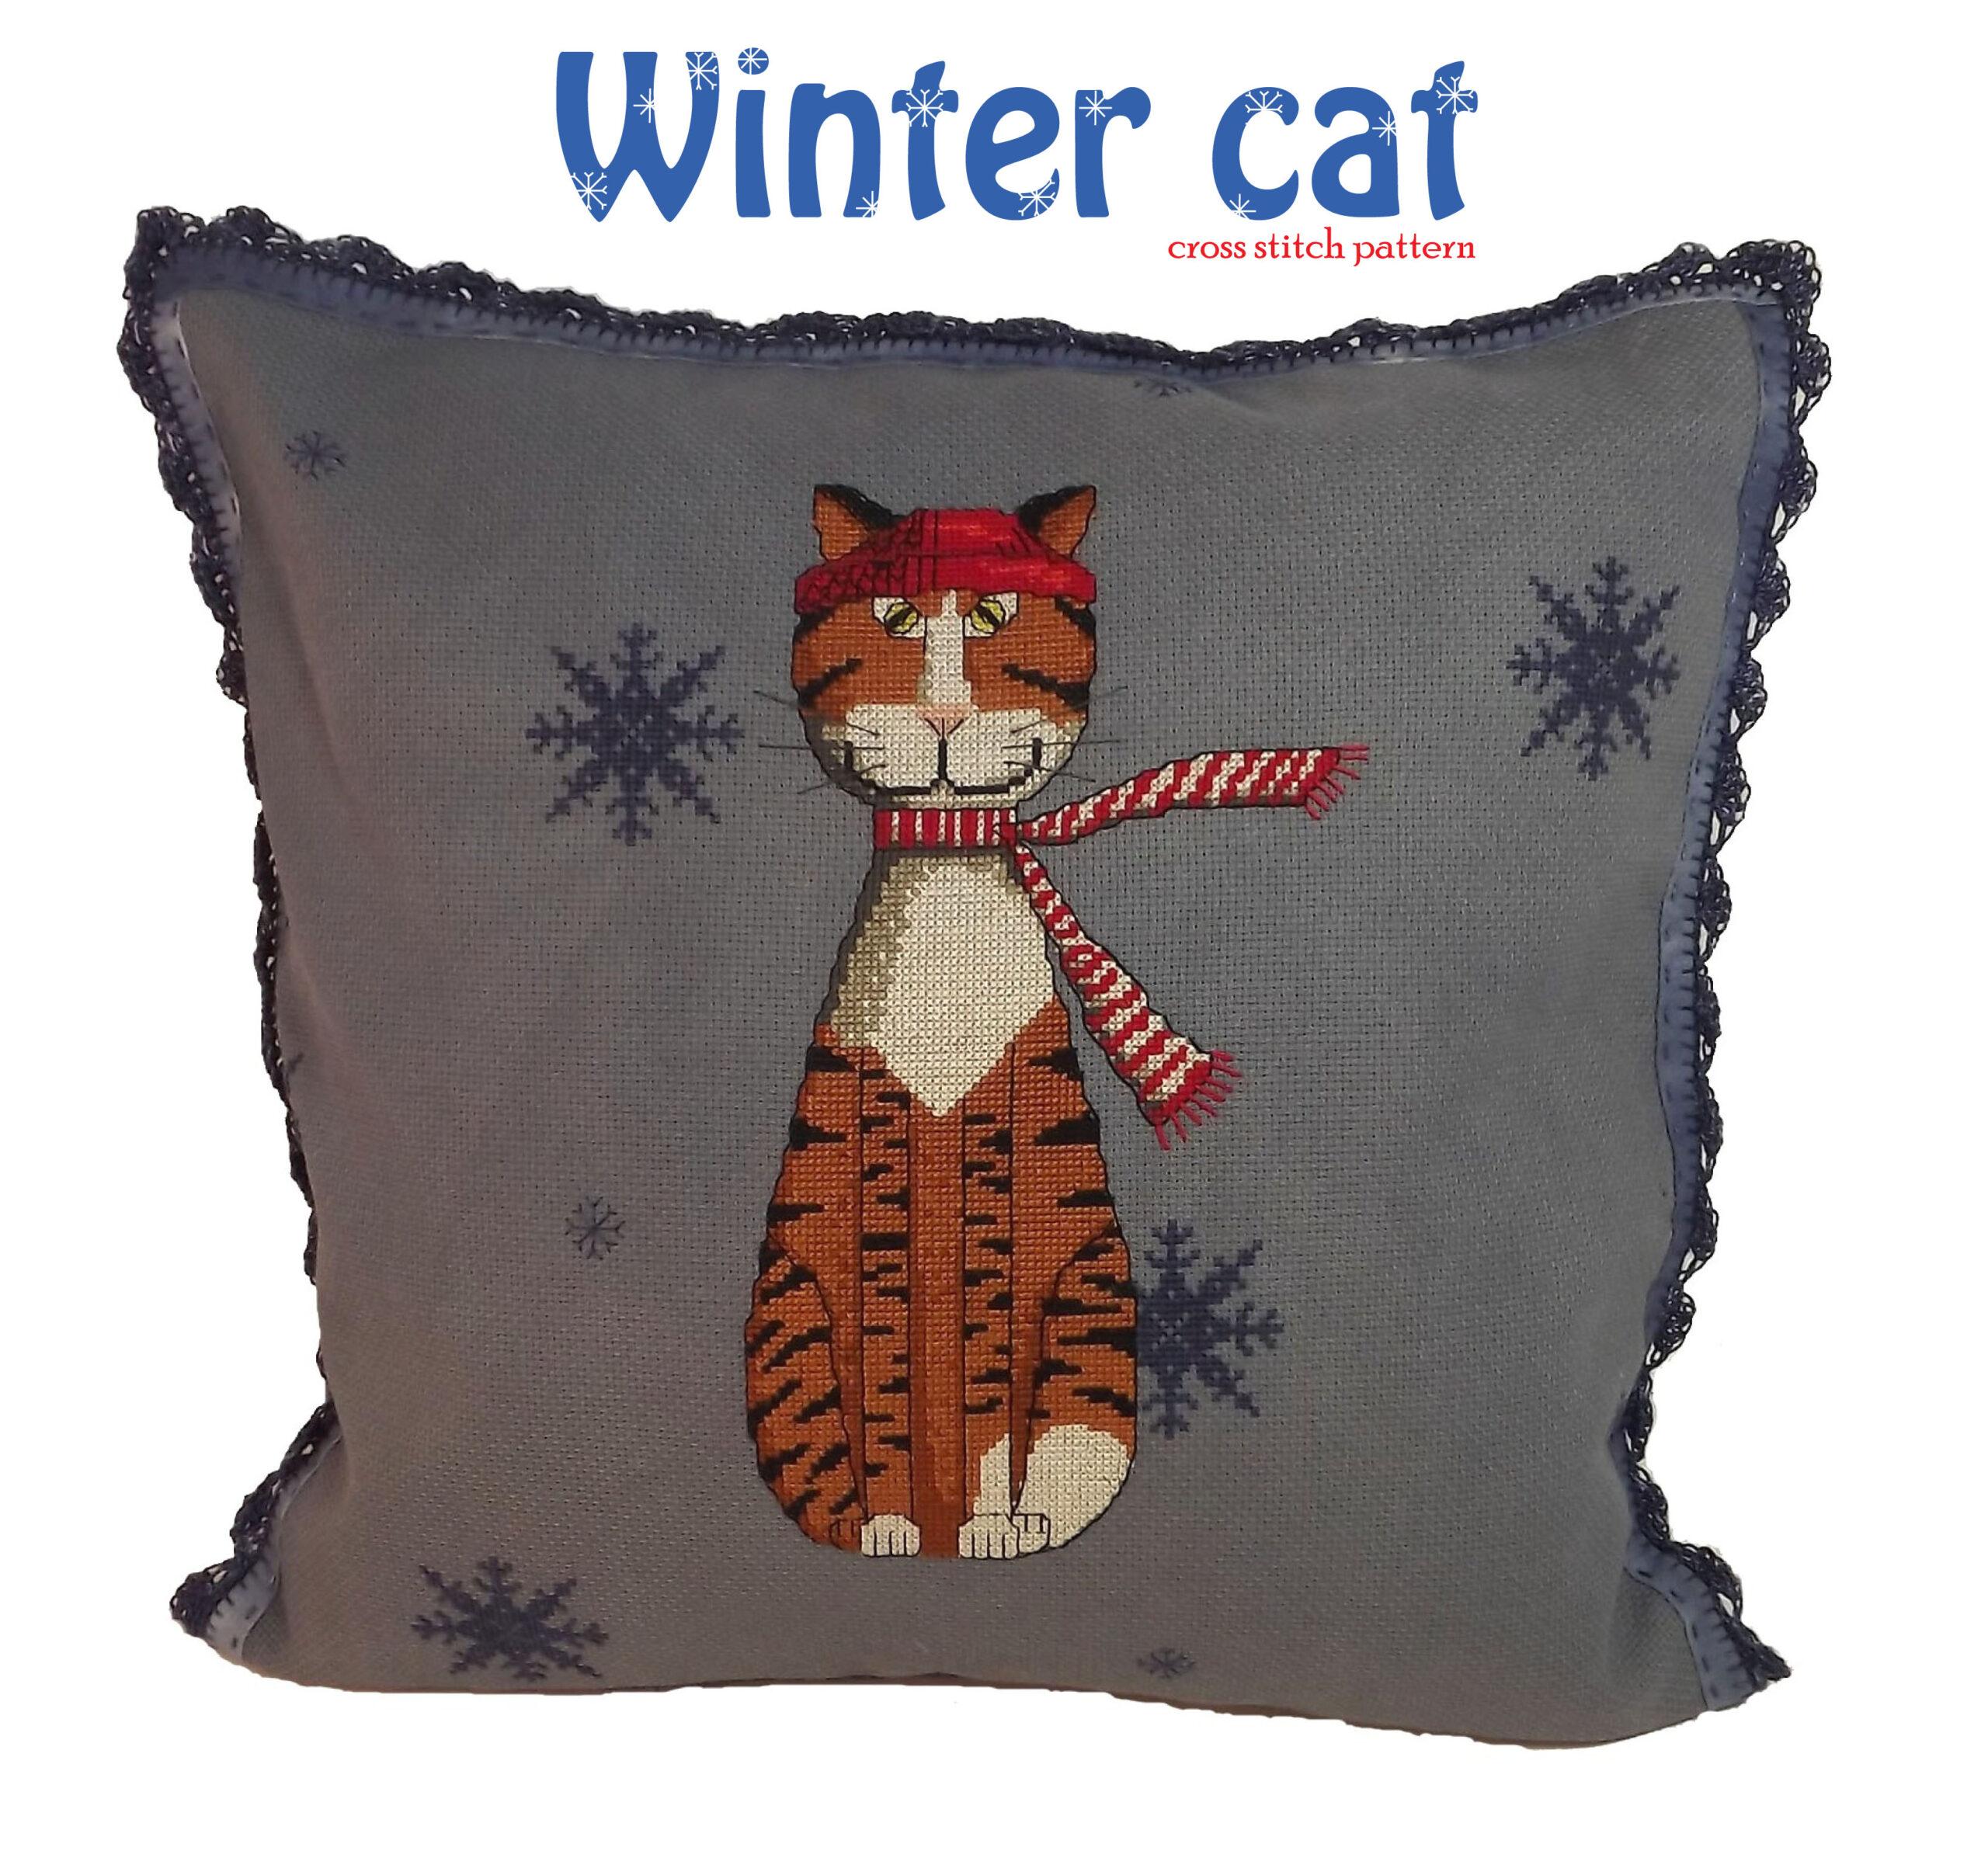 WinterCat New pattern